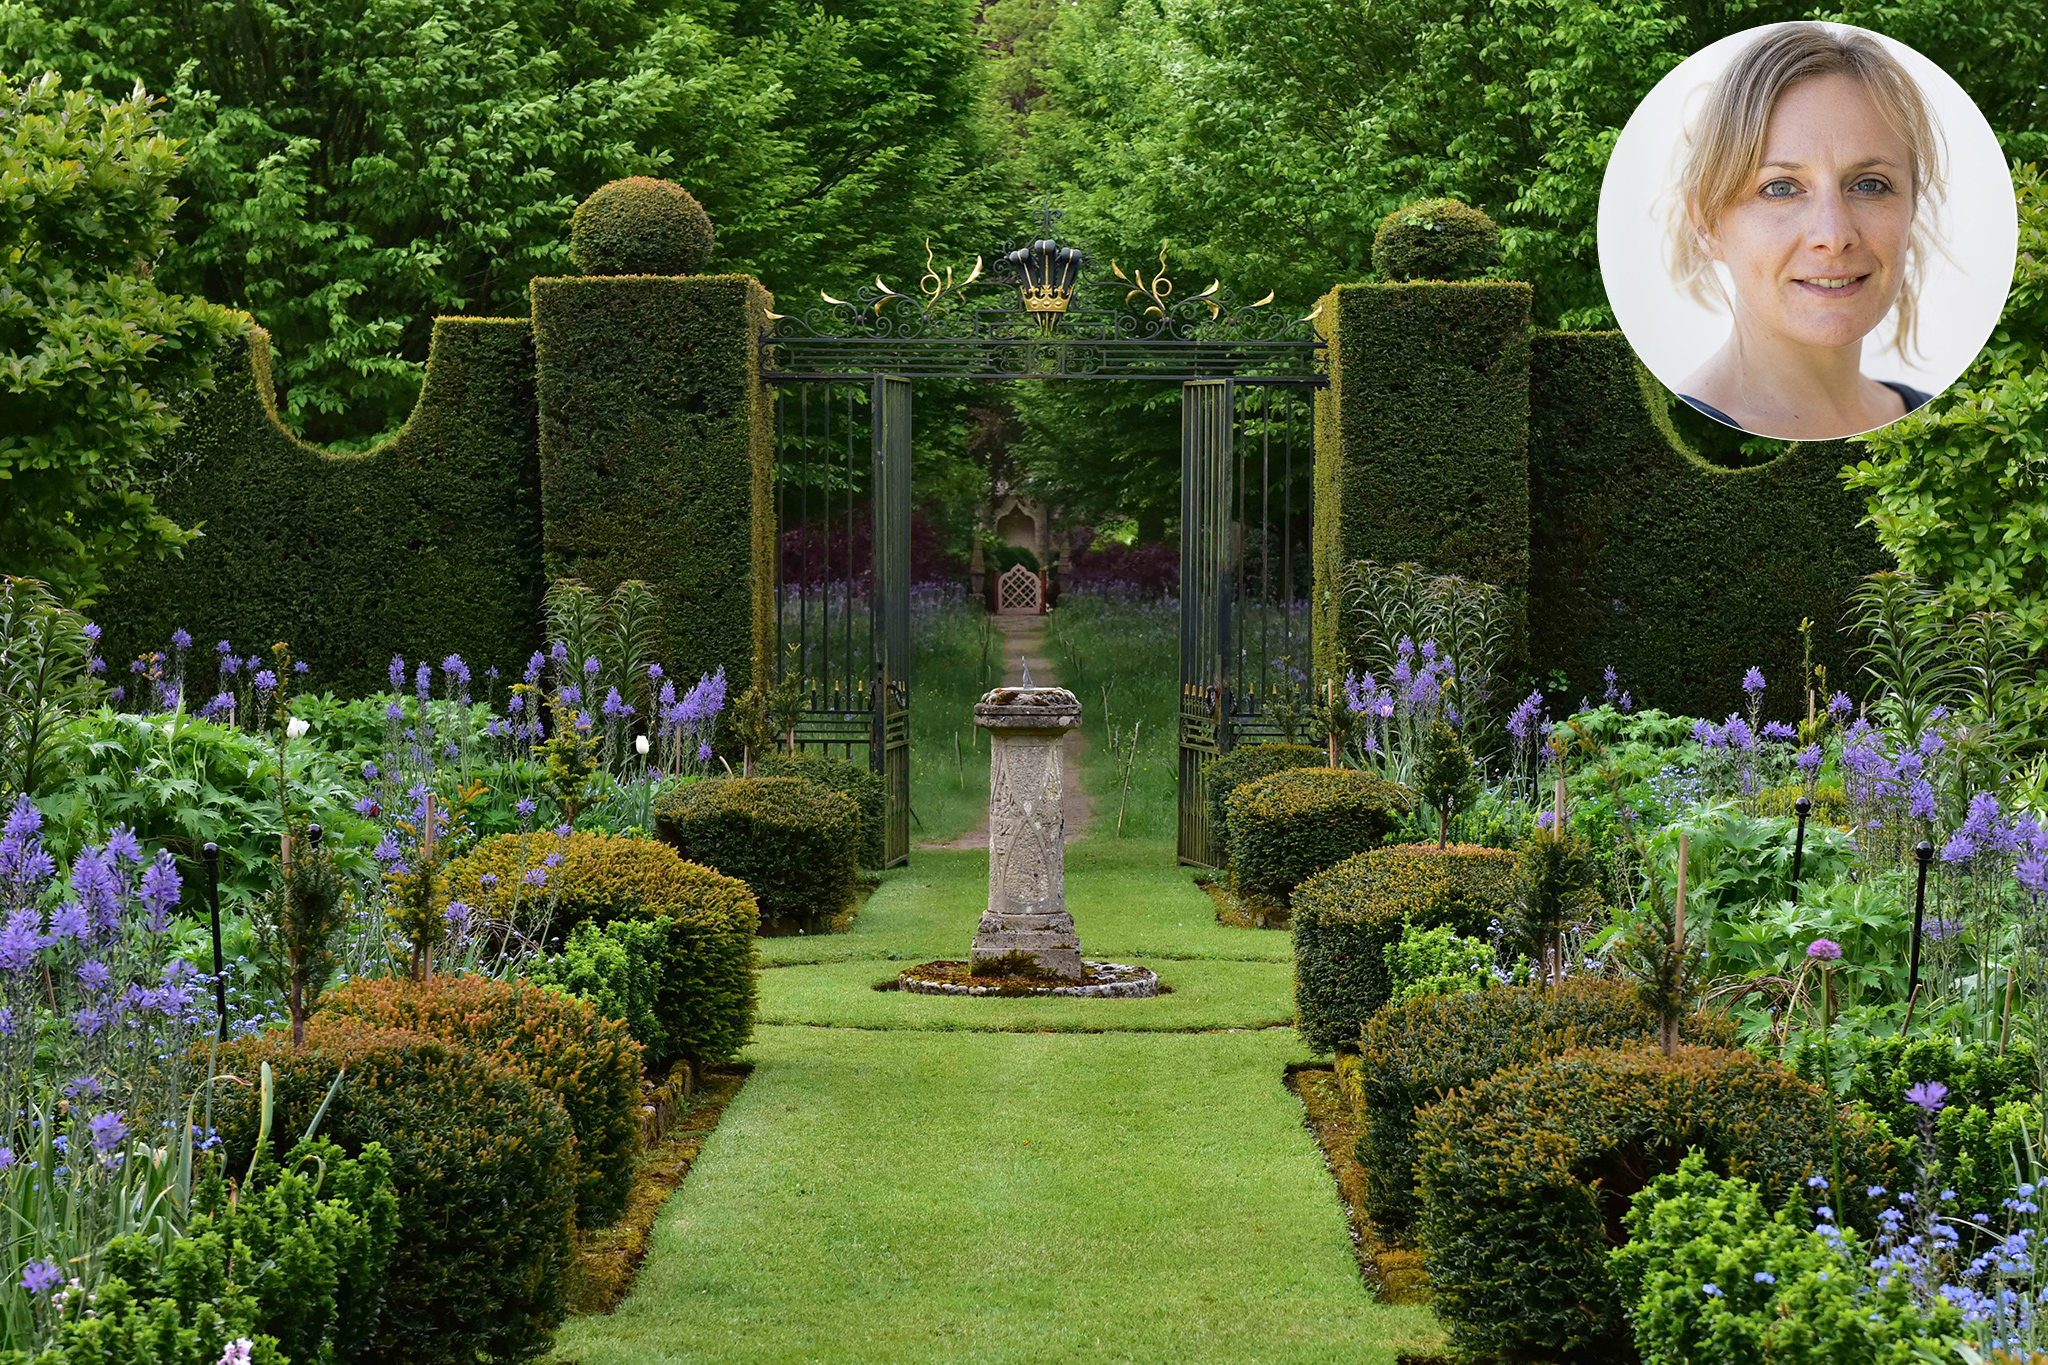 highgrove-talking-gardens-festival-kate-bradbury-2048-1365